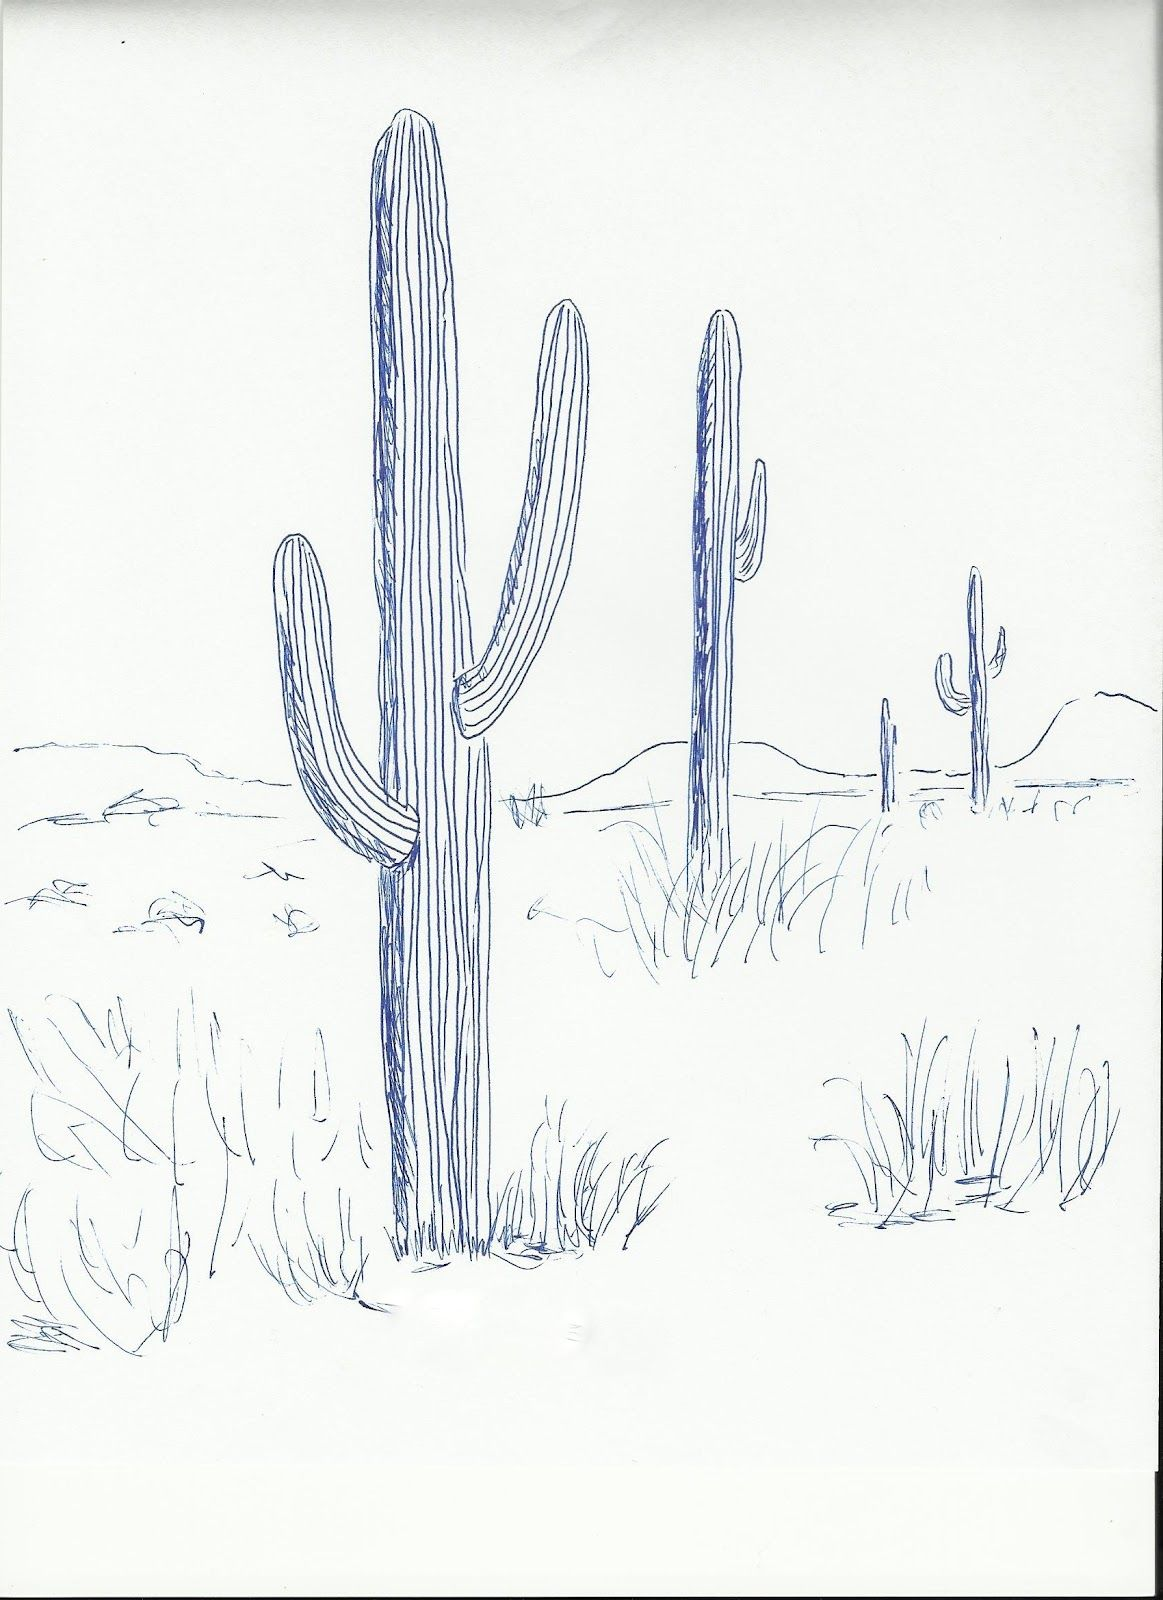 Cactus | Art class ideas | Teach art | Pinterest | Cactus, Dibujo y ...